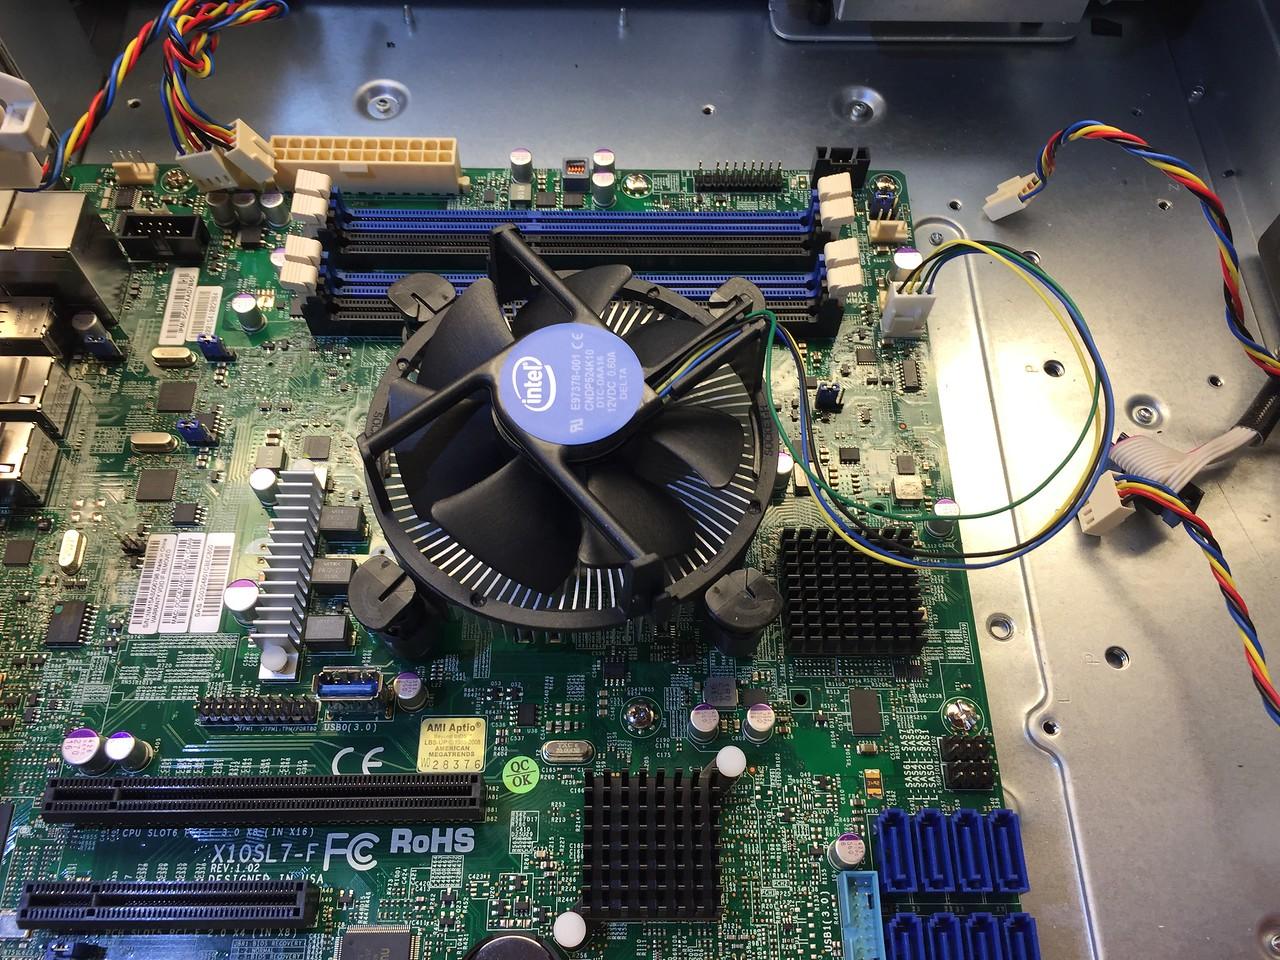 CPU cooler installed